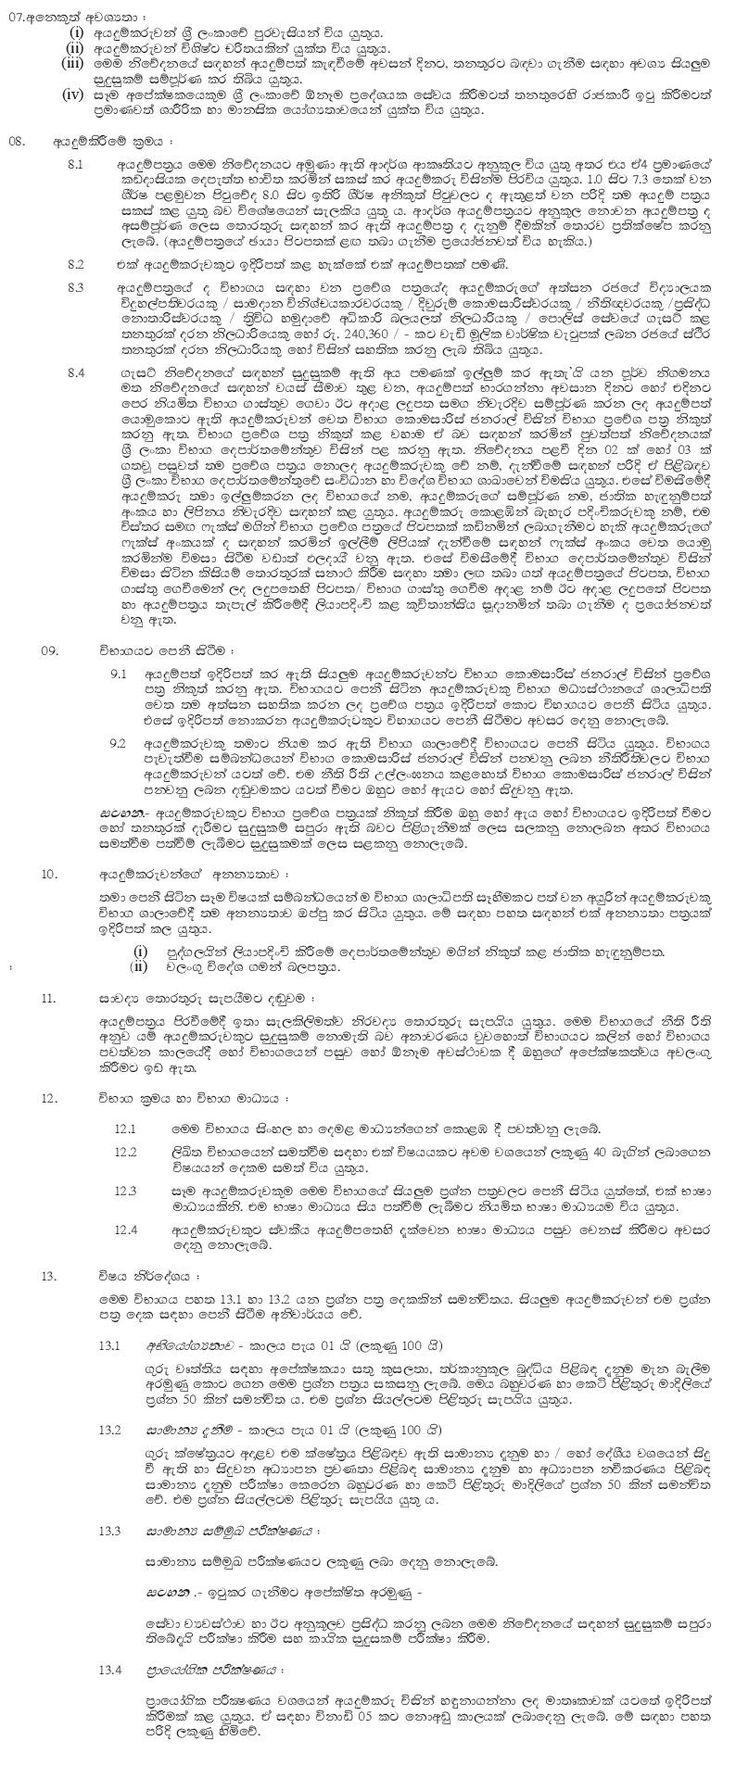 Graduates Teacher Vacancies (Open) - Ministry of Education